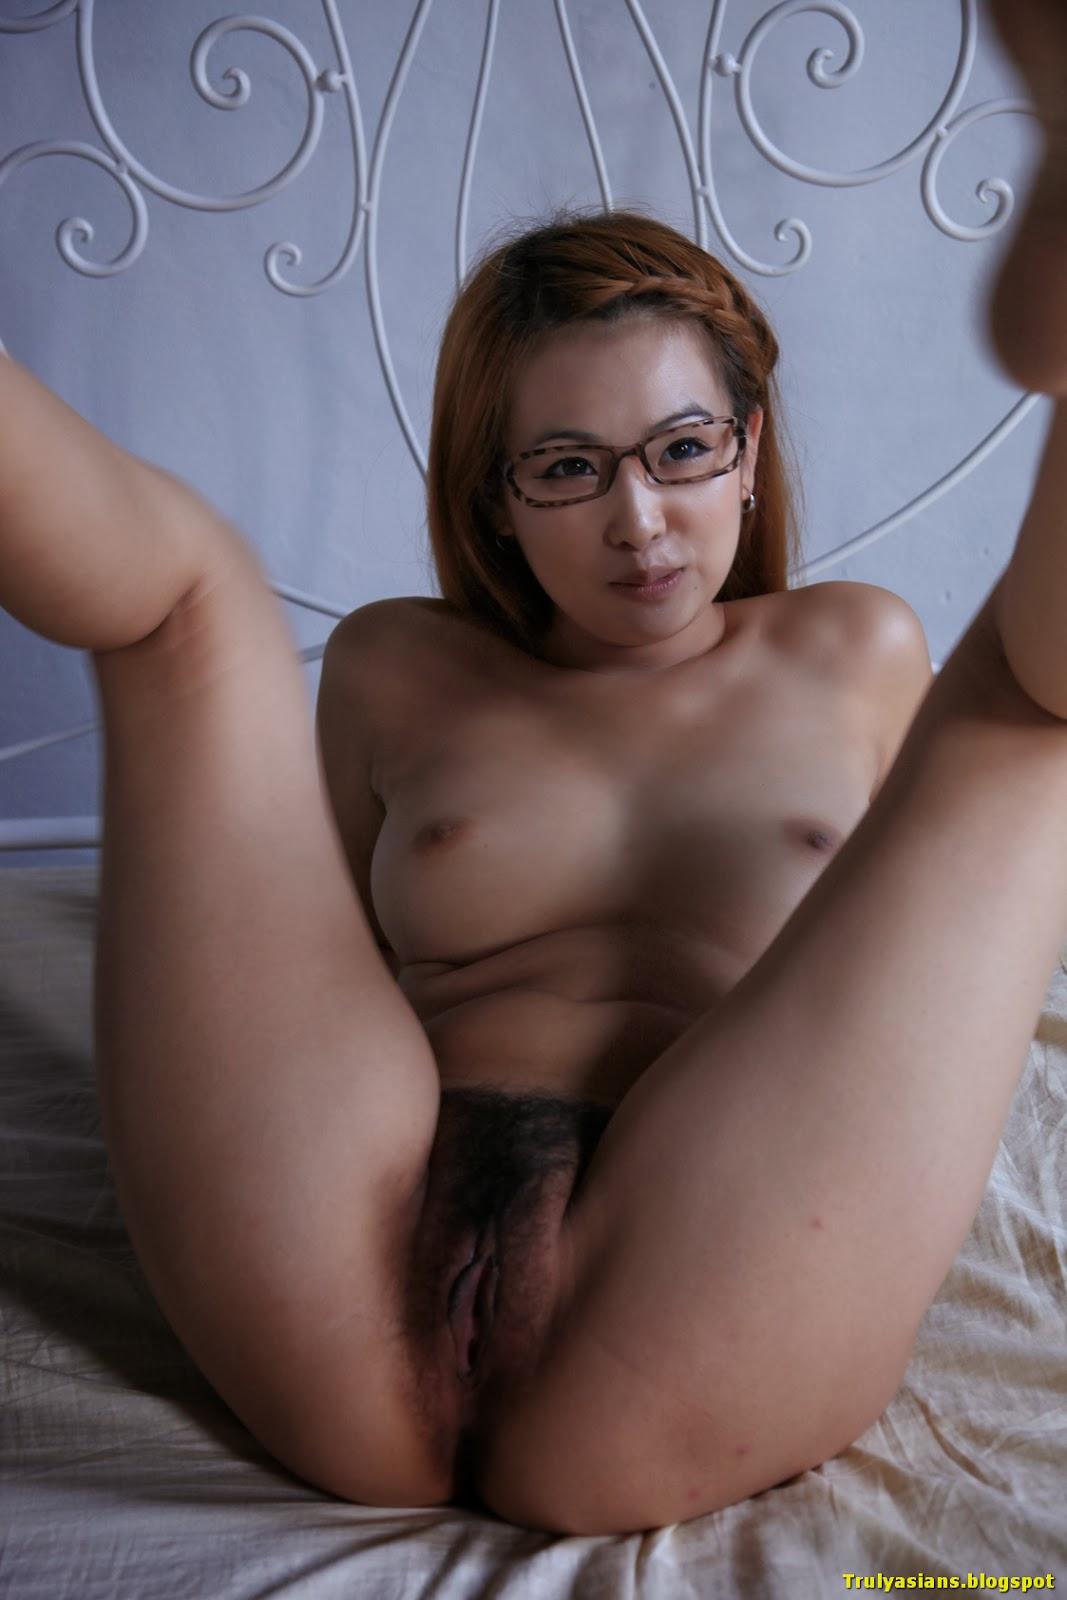 Fat chinese aged girls nude, girls flashing at club